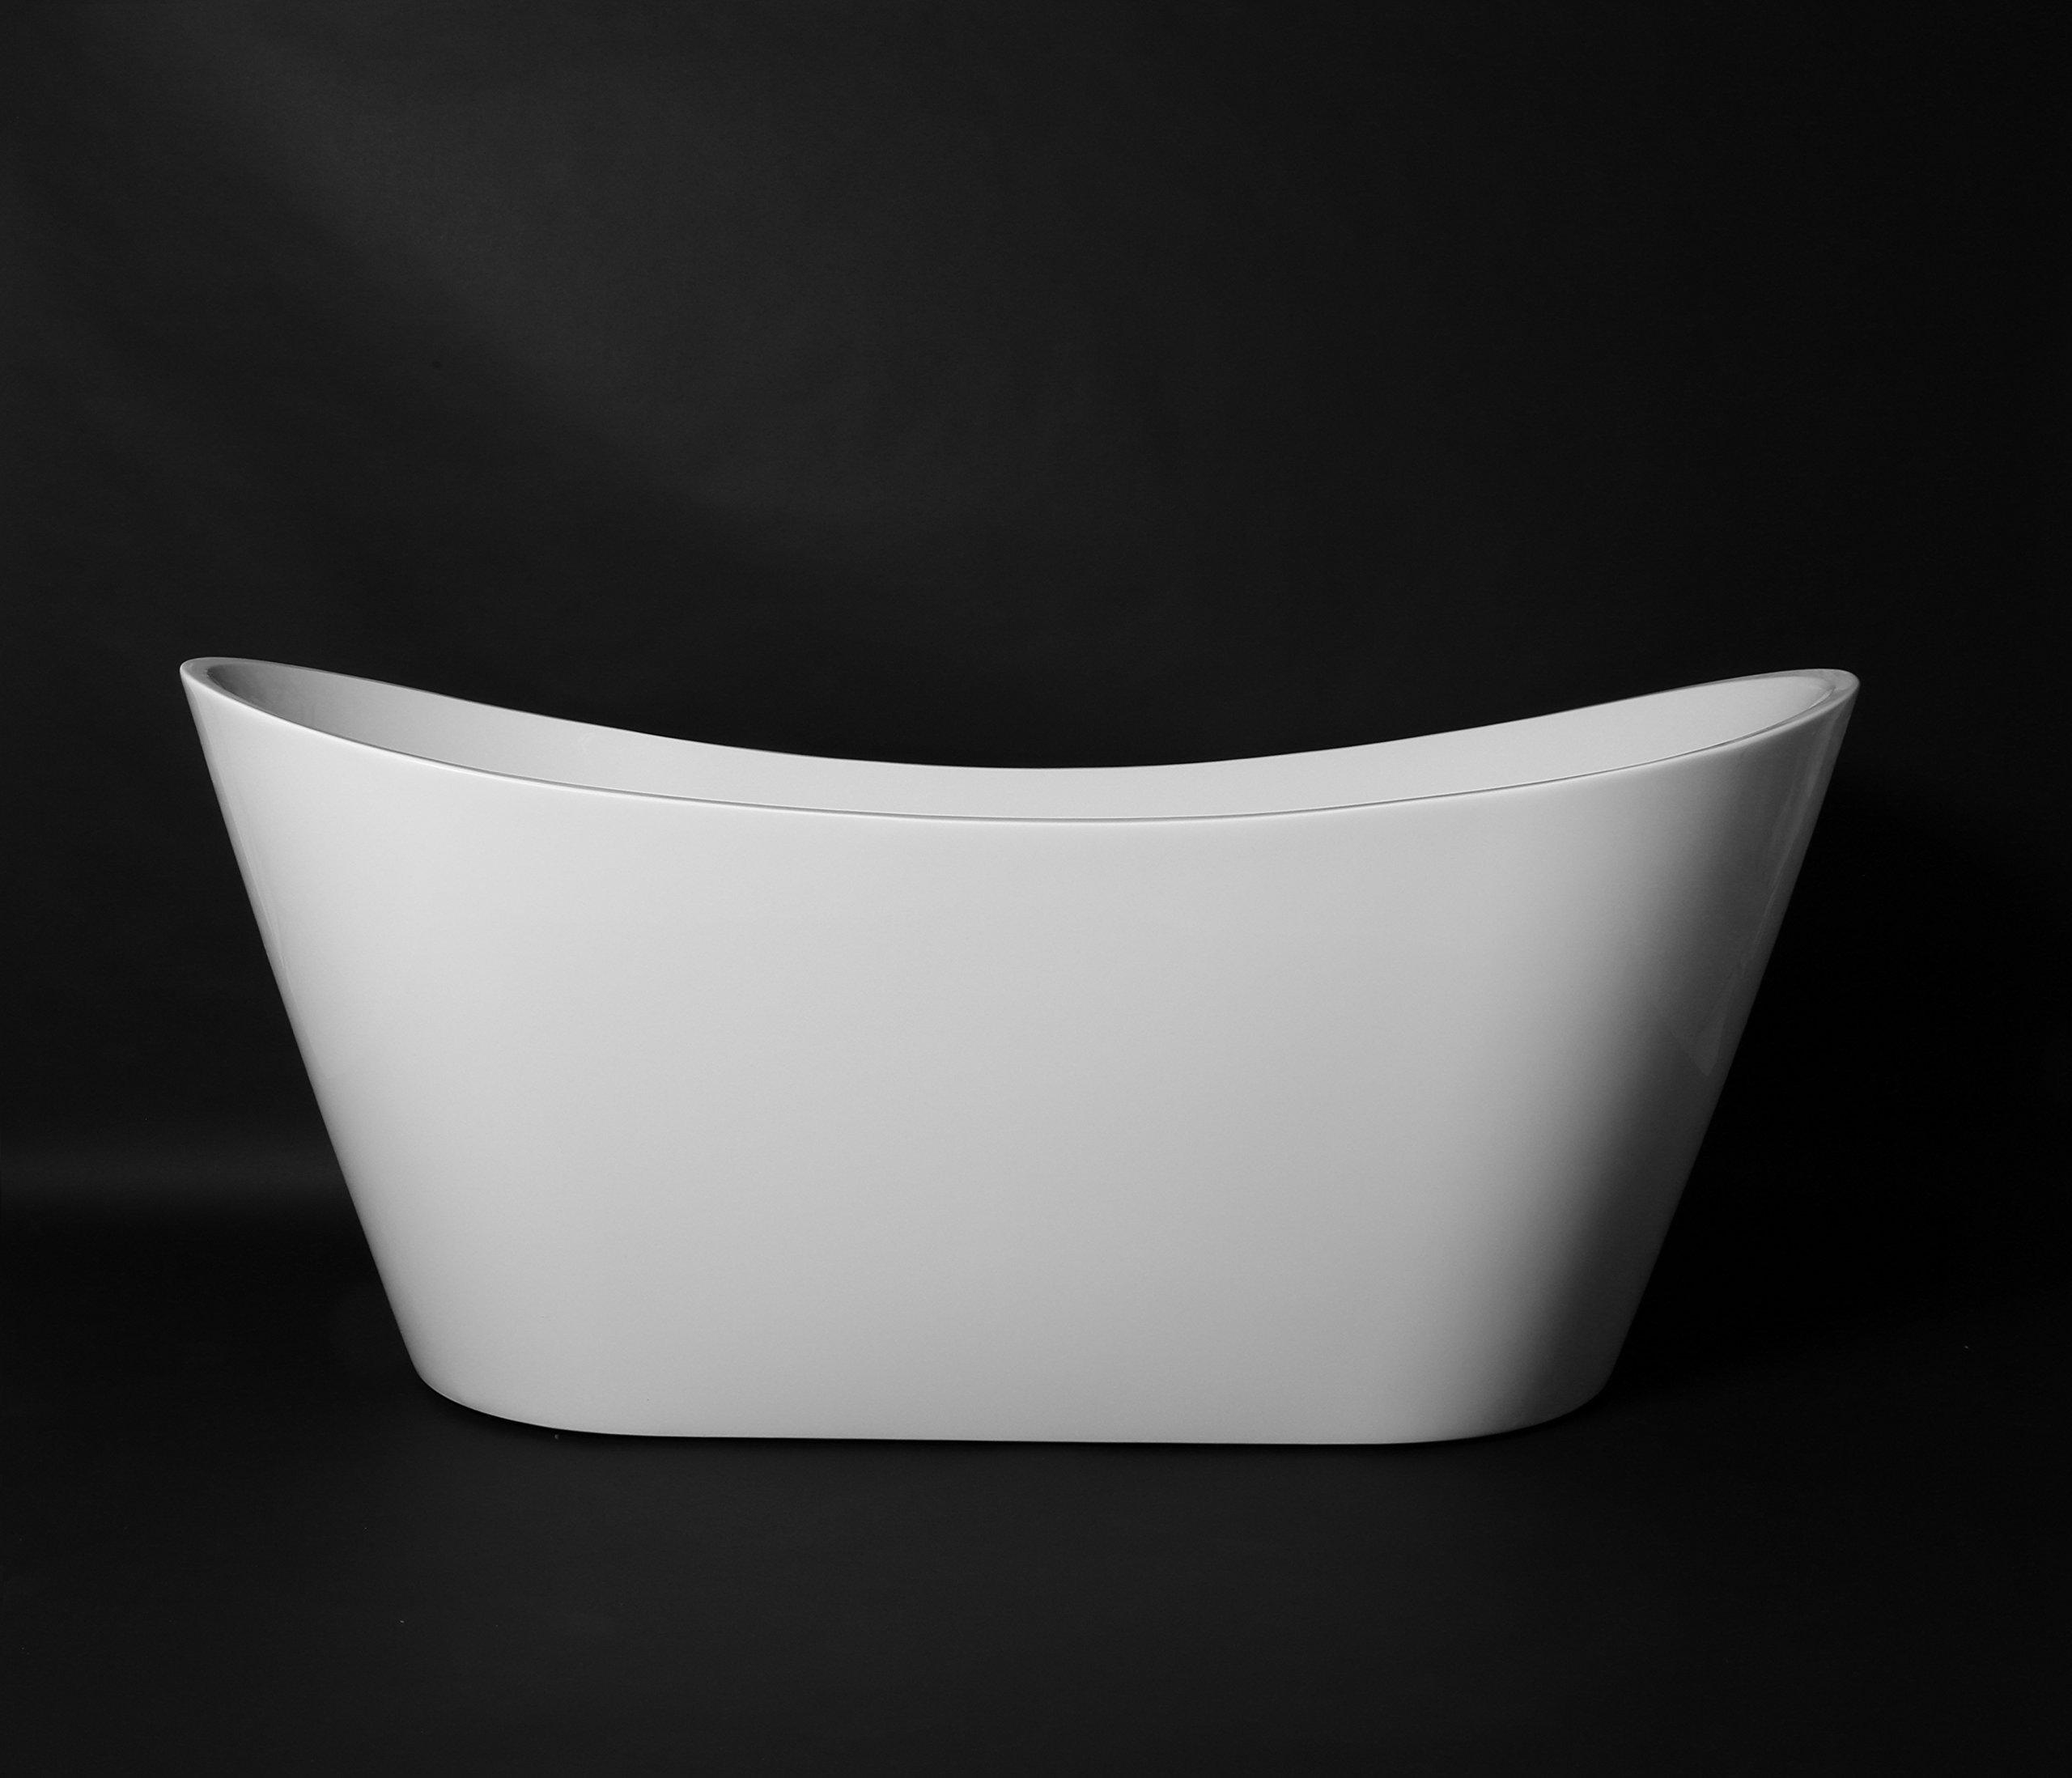 "Kokss Bolsena Modern Acrylic Freestanding Soaking Bath Tub Spa 67"", White, Oval, Luxury hot tub spa"